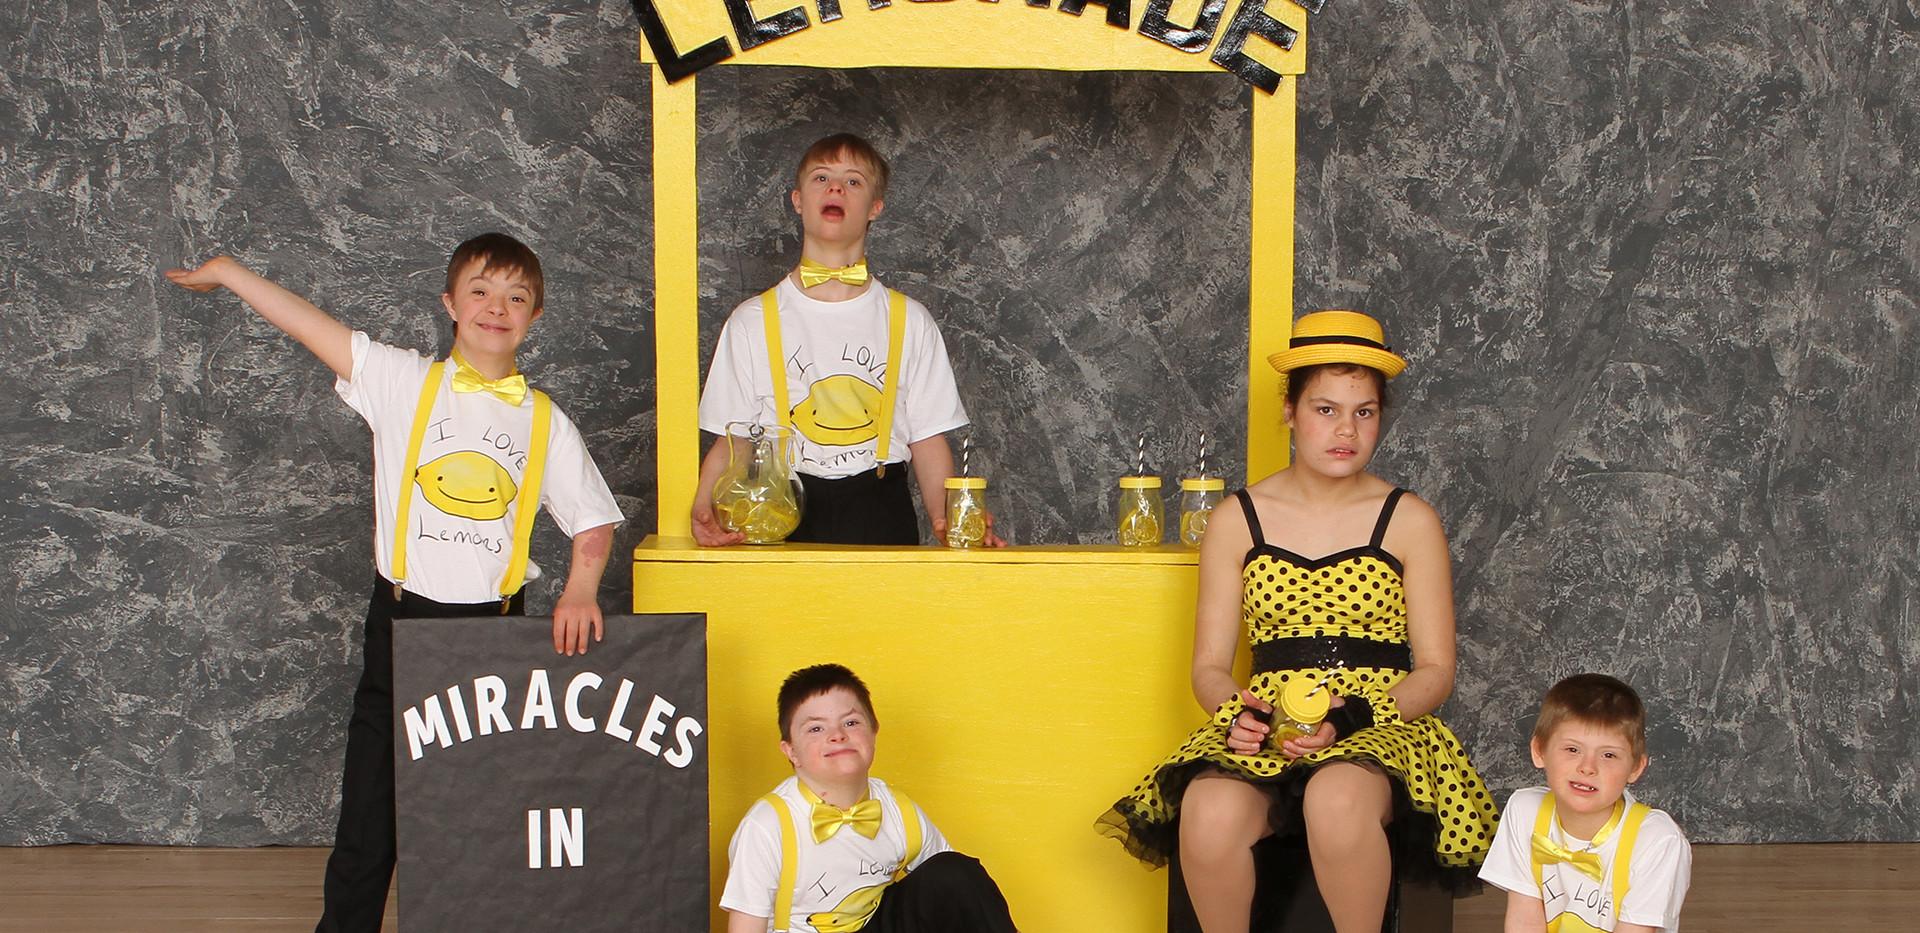 lemonade_9558.JPG